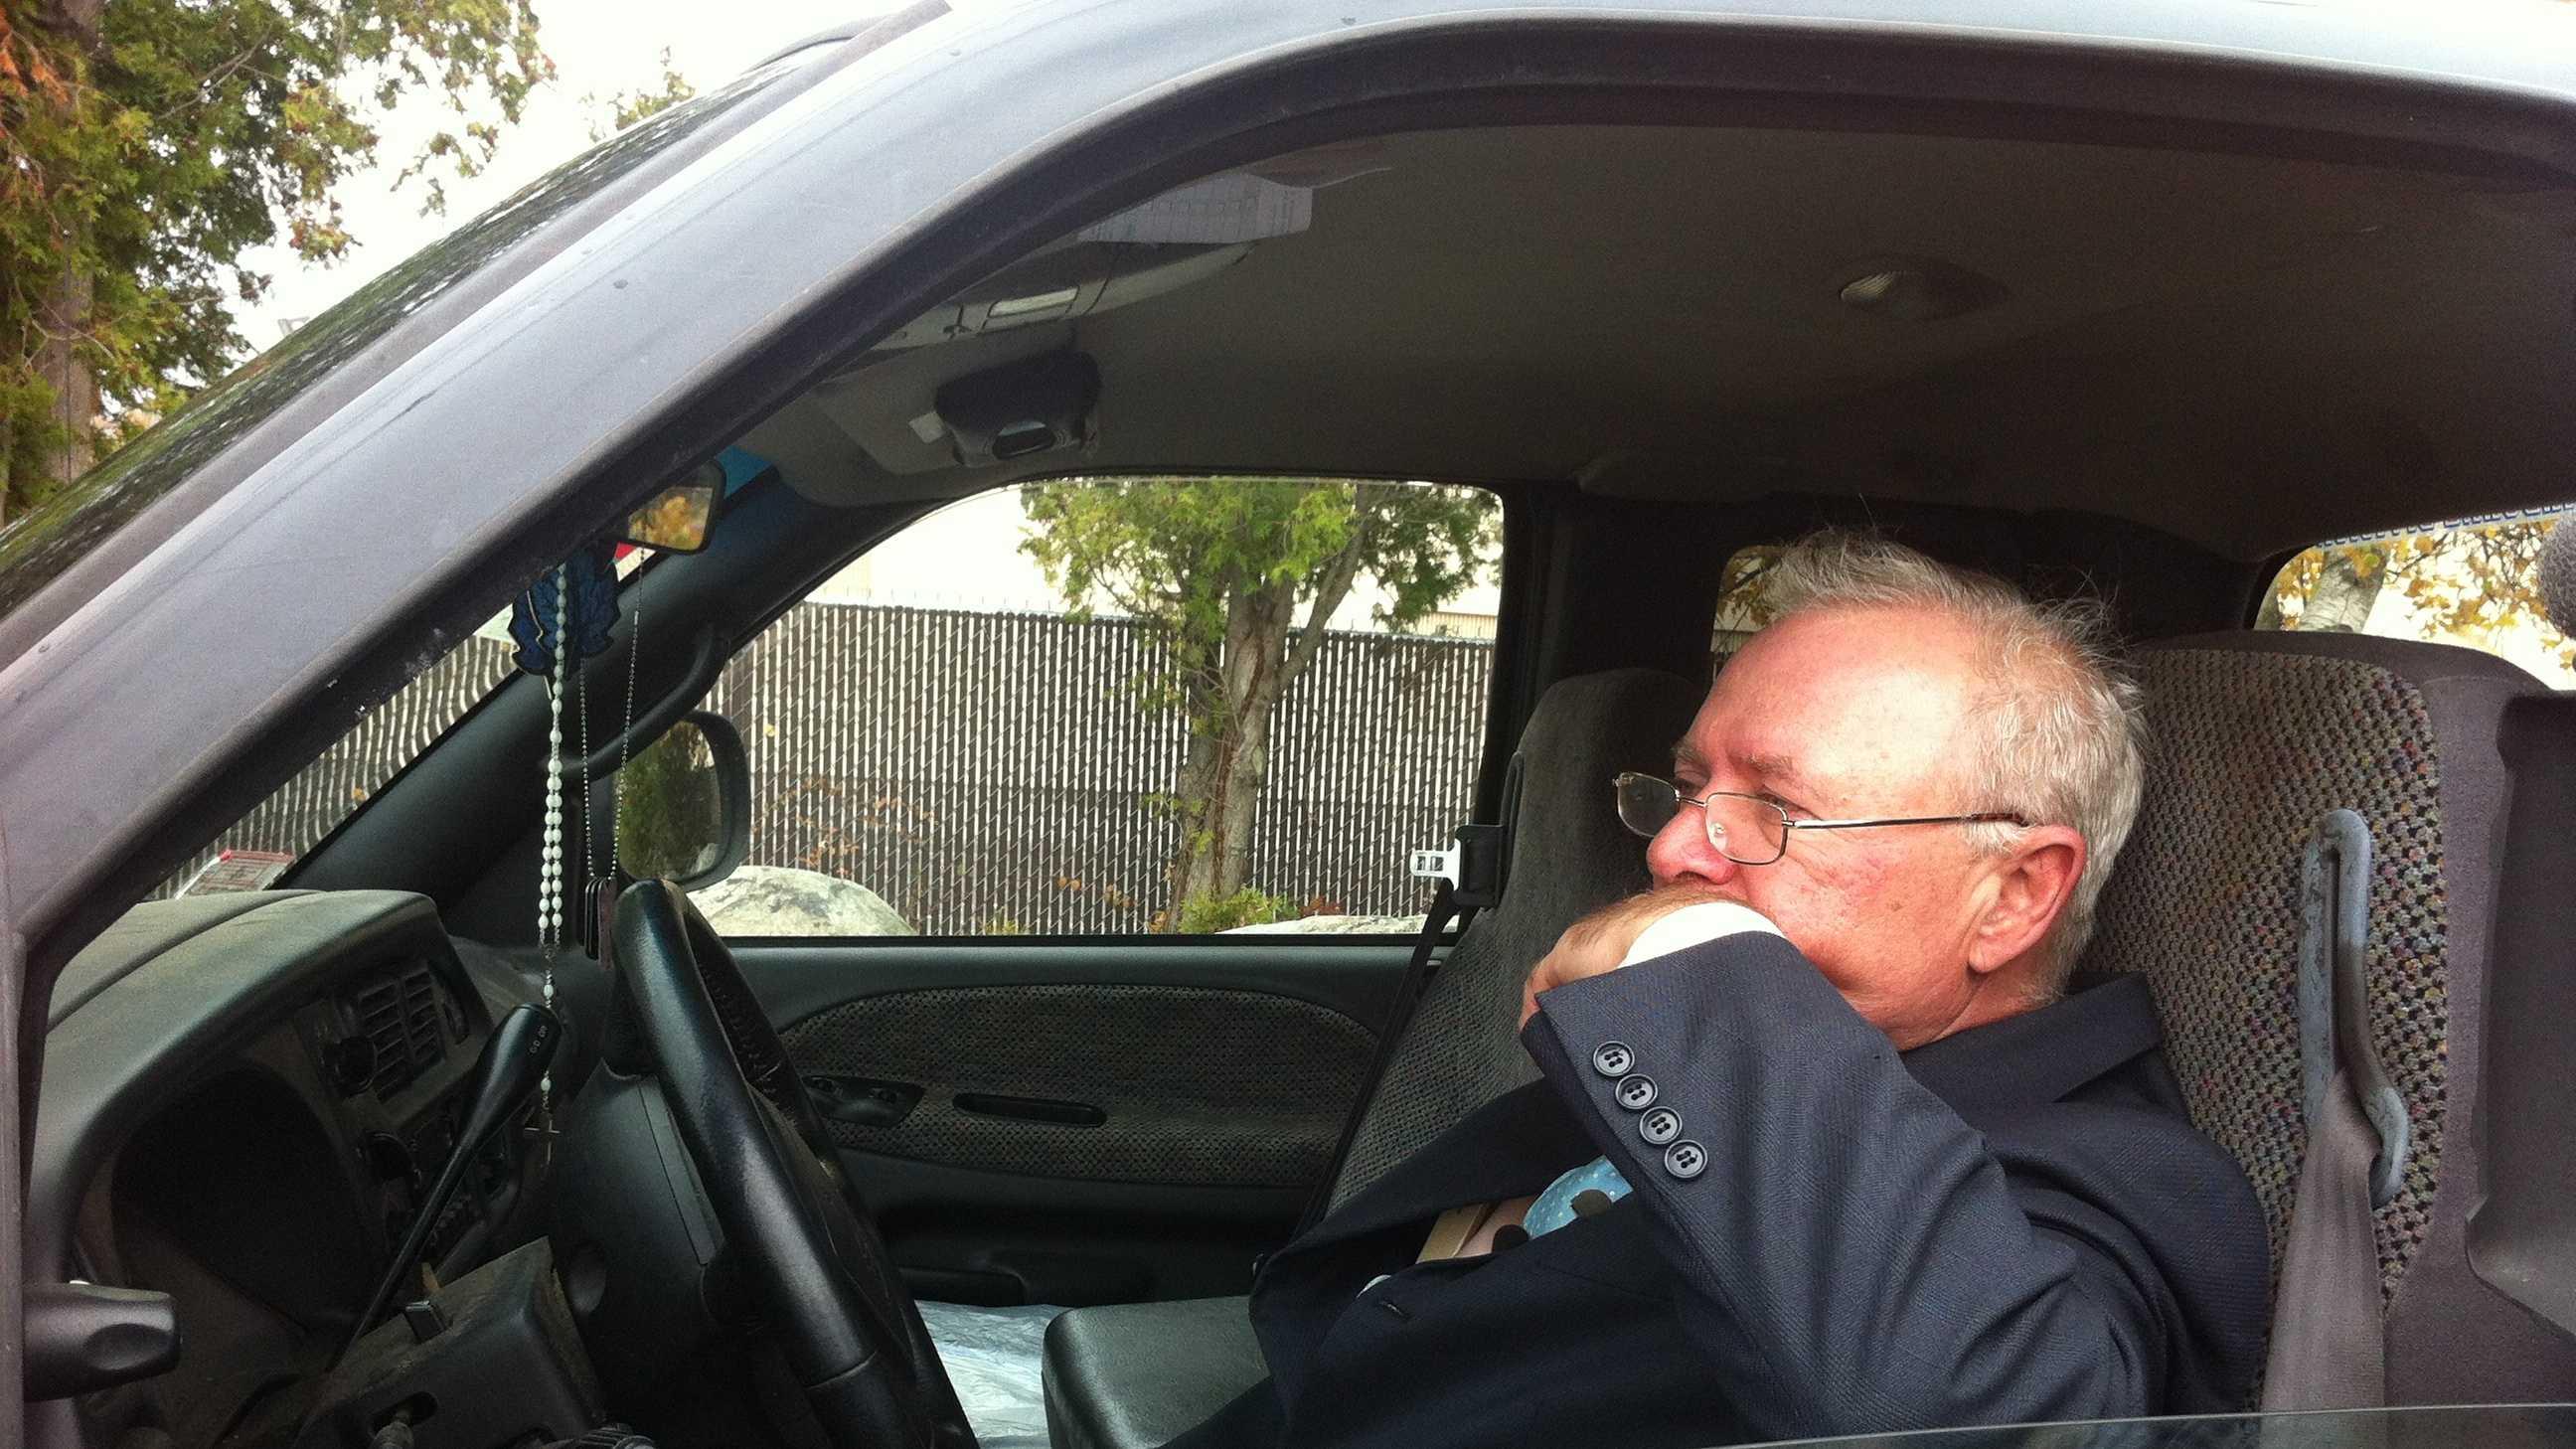 Paul Monti in truck